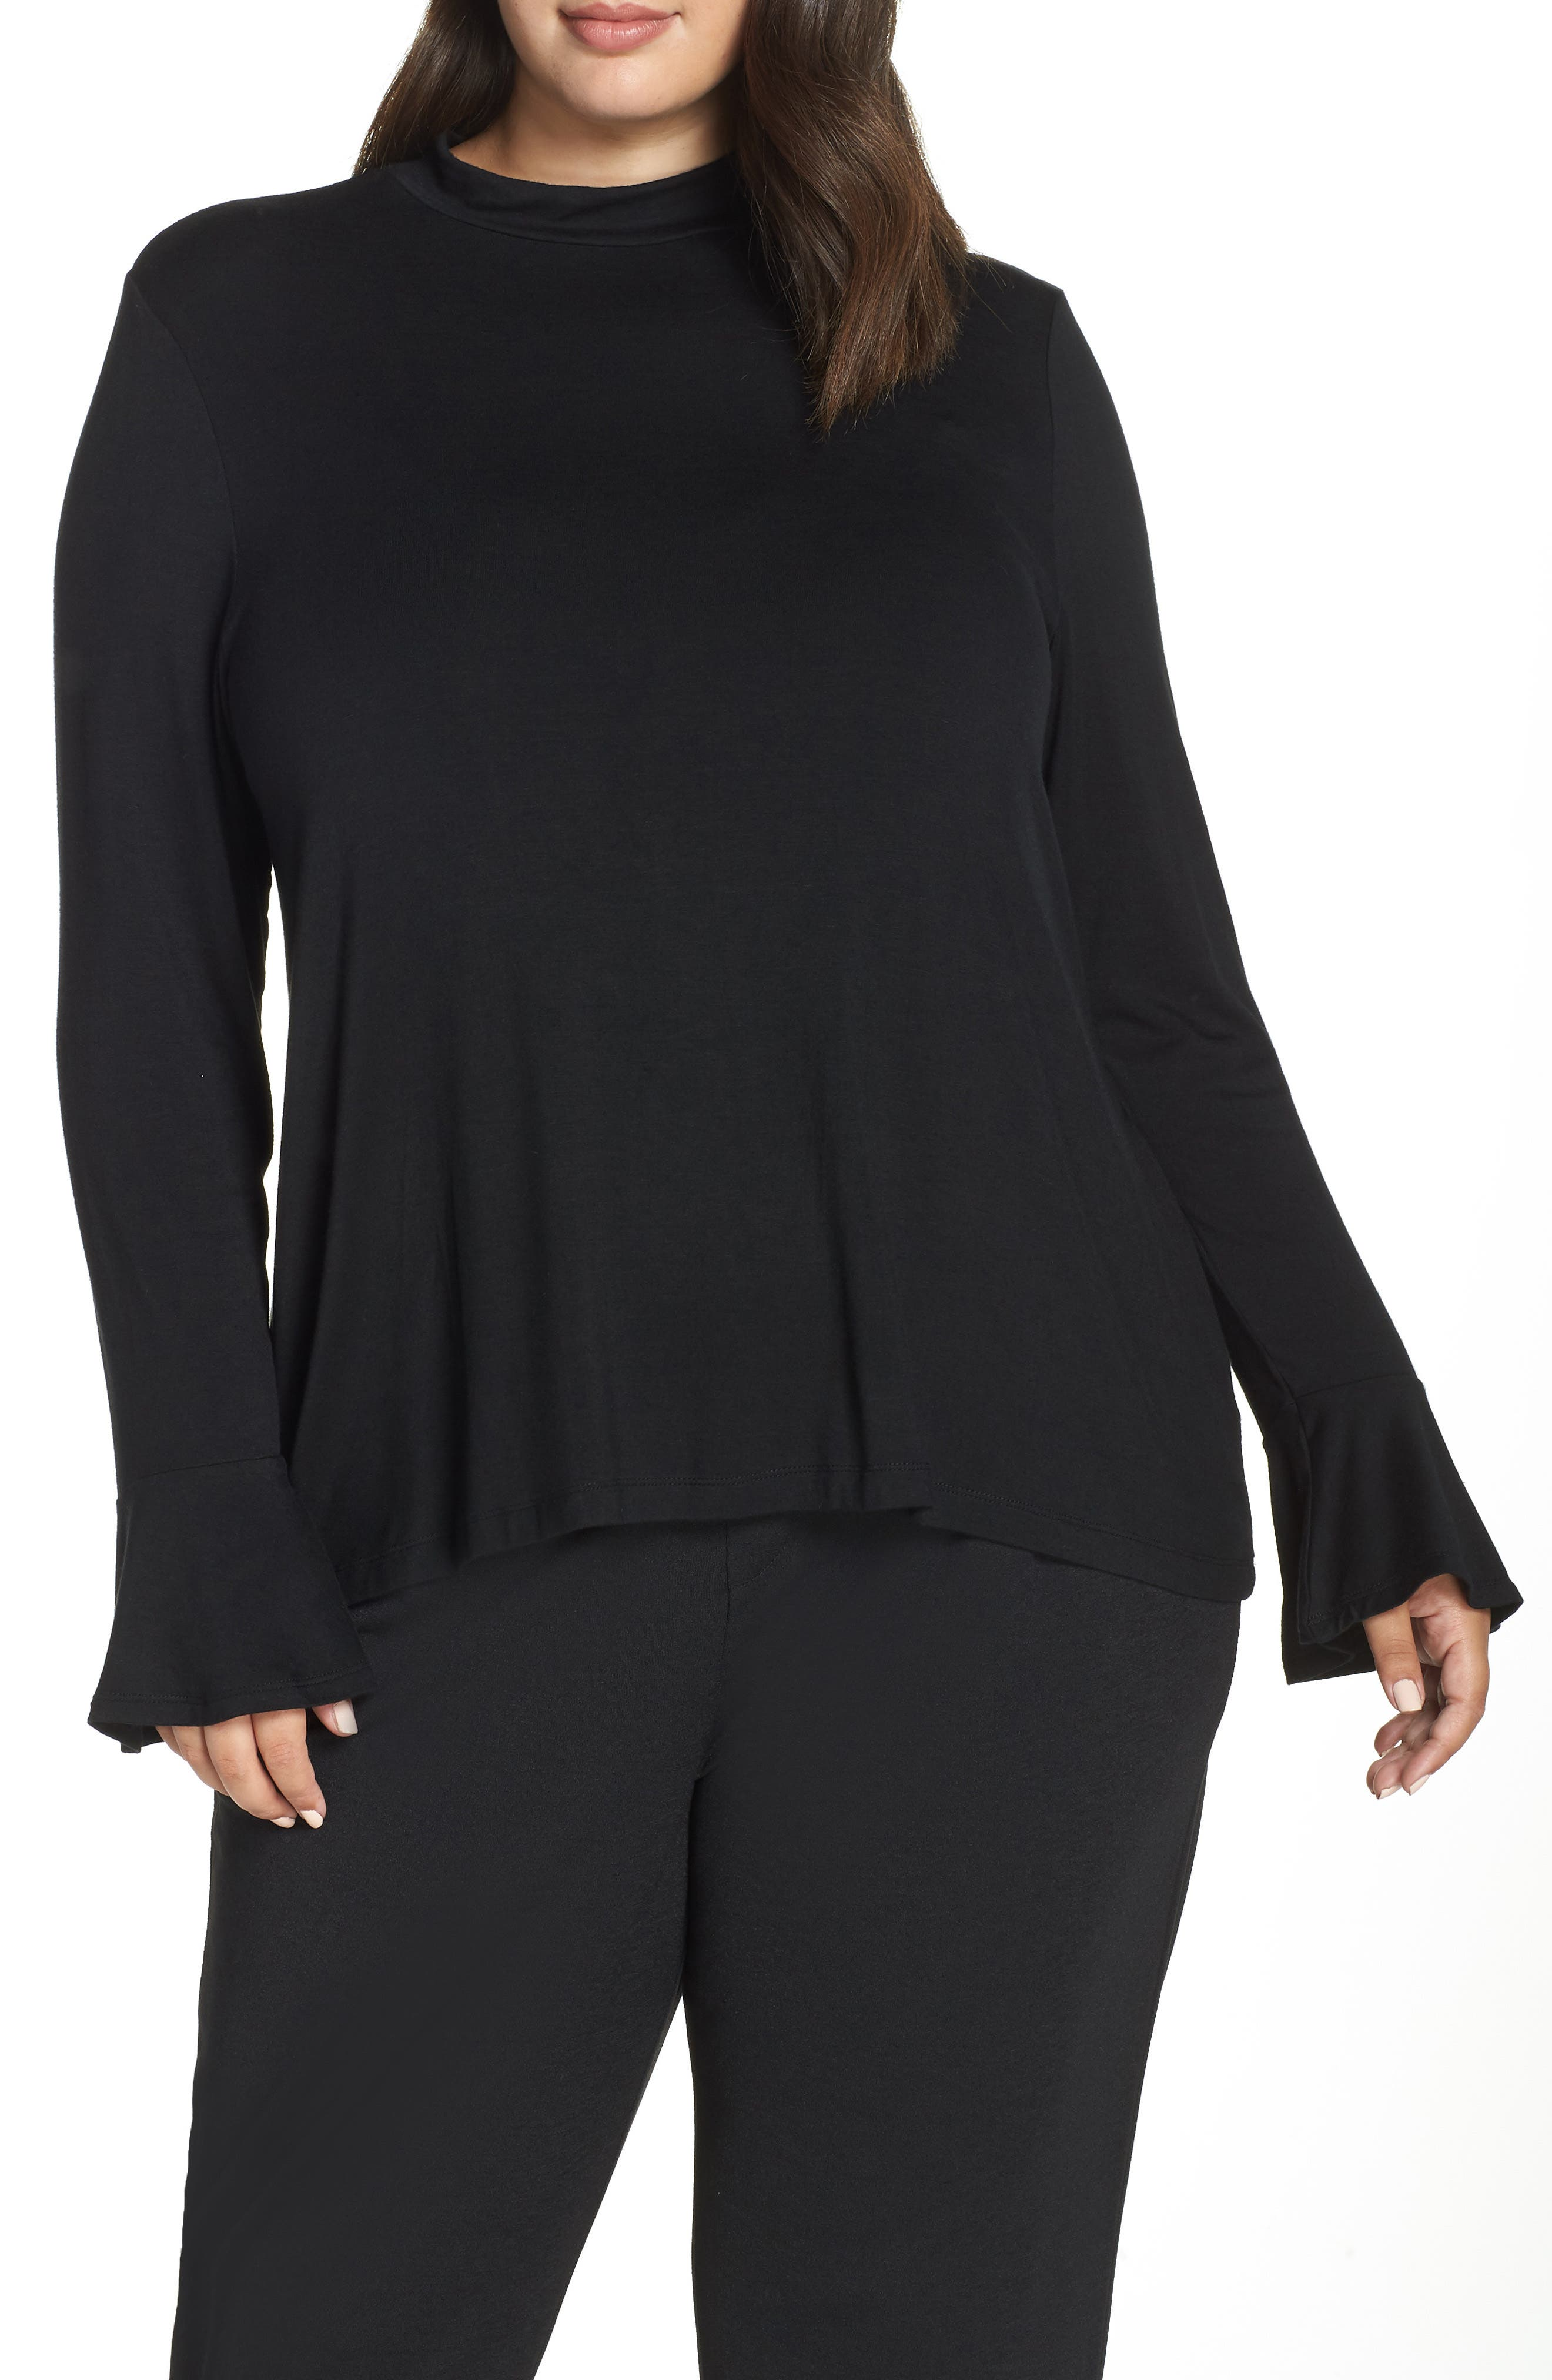 Image of LEMON TART Odette Long Sleeve Top